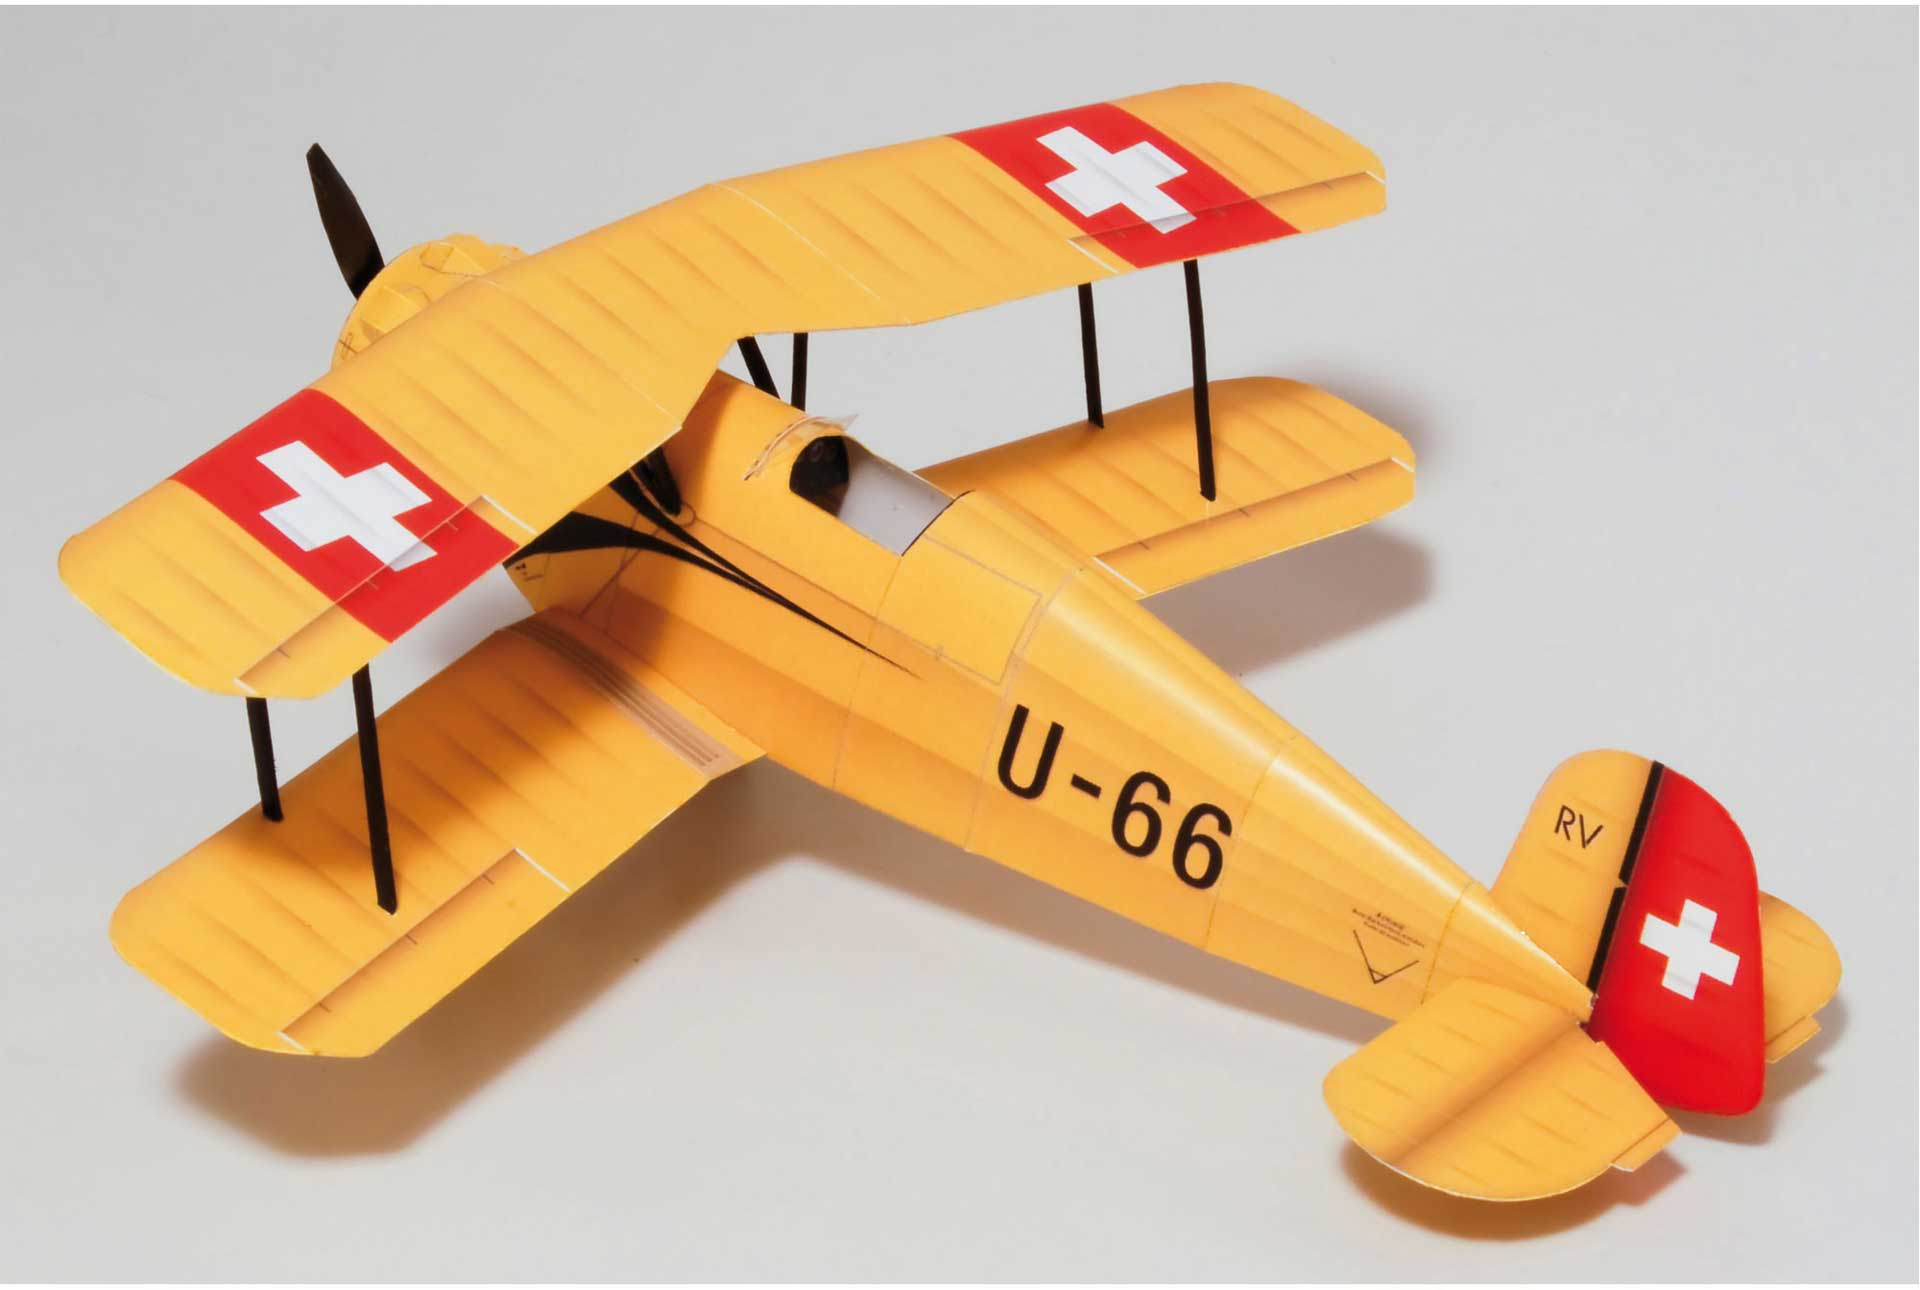 PAPER-MODEL Bücker 133 Jungmeister U-66 1:33 Kartonmodell aus Papier und Karton